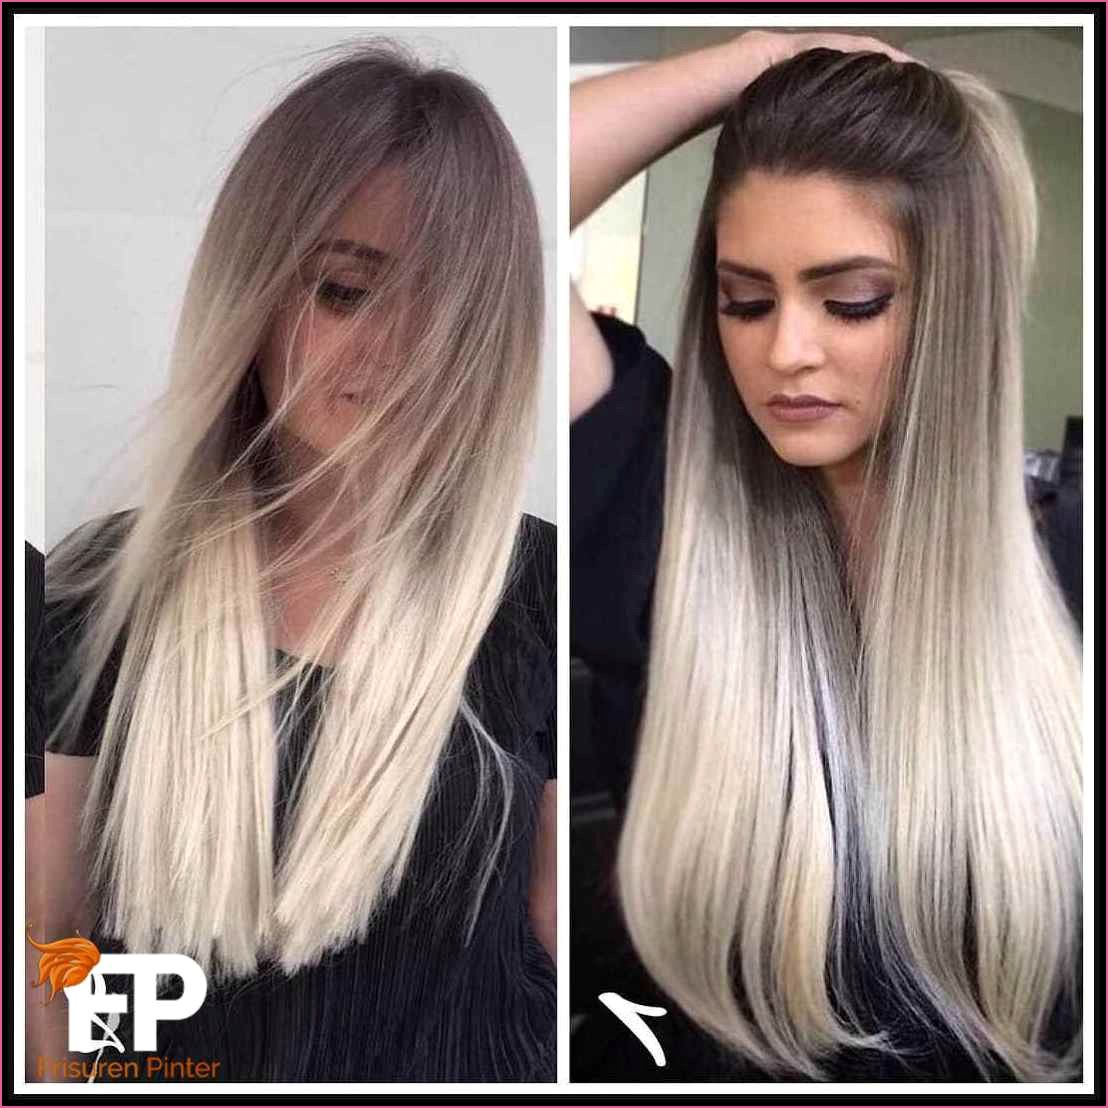 Mittellange Haare Frisuren Damen  Mittellange haare frisuren